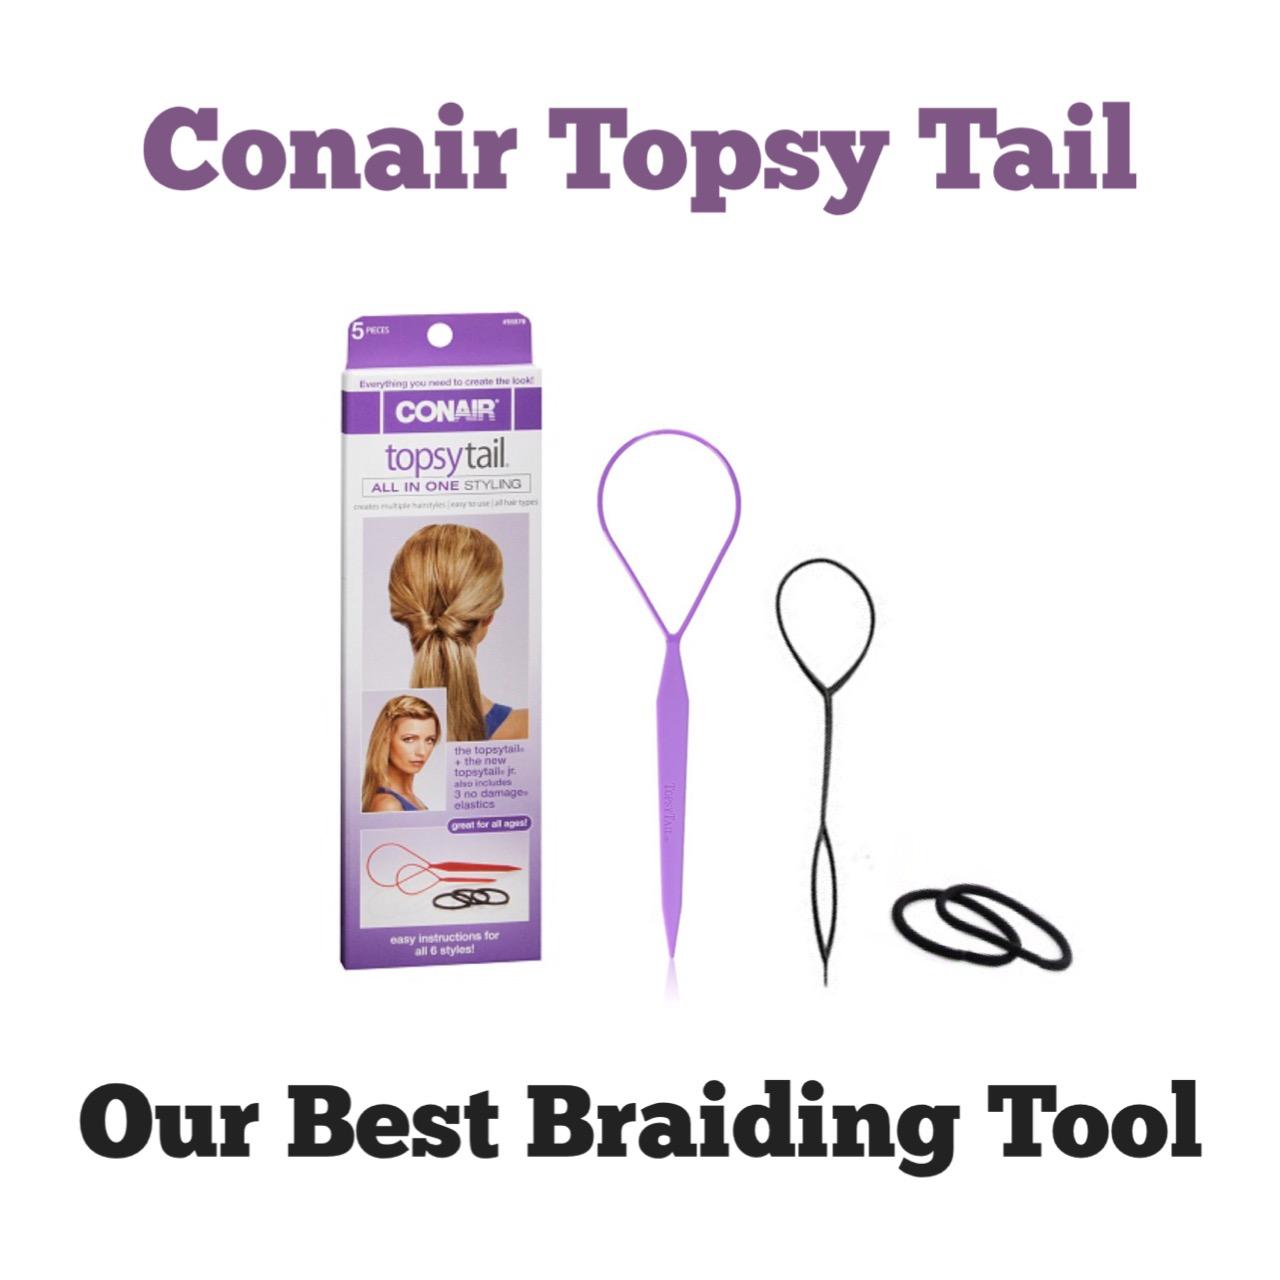 Conair Topsy Tail Tool